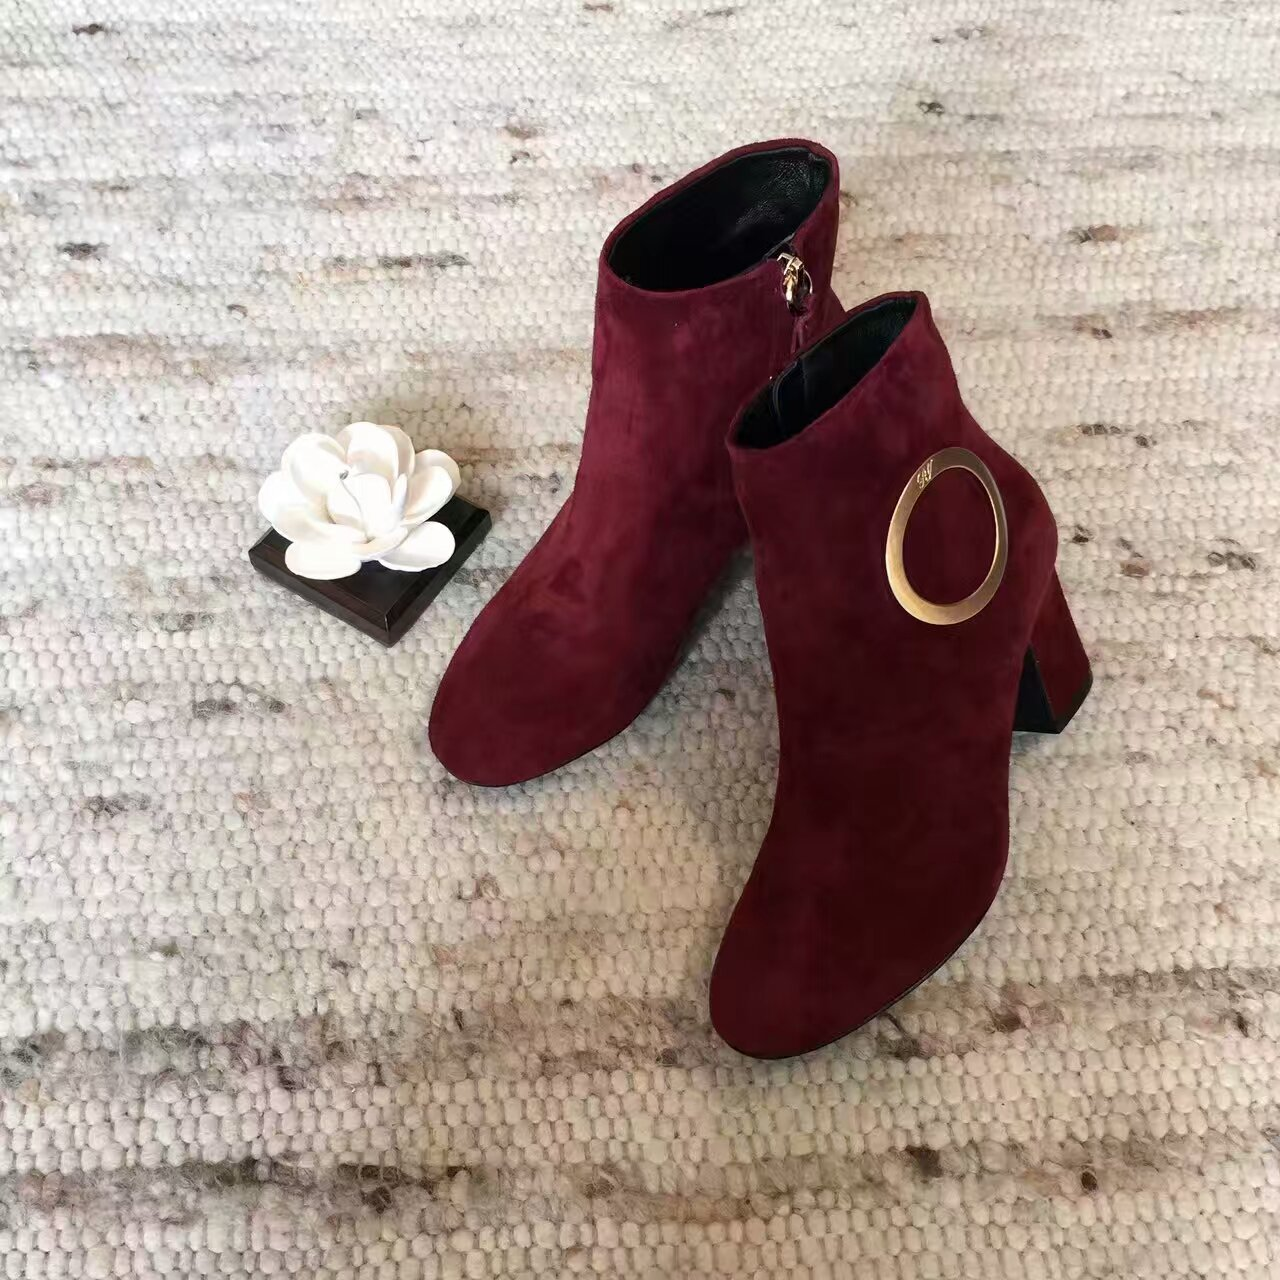 【Roger Vivier 】RV2016推出秋冬新款踝靴_短靴